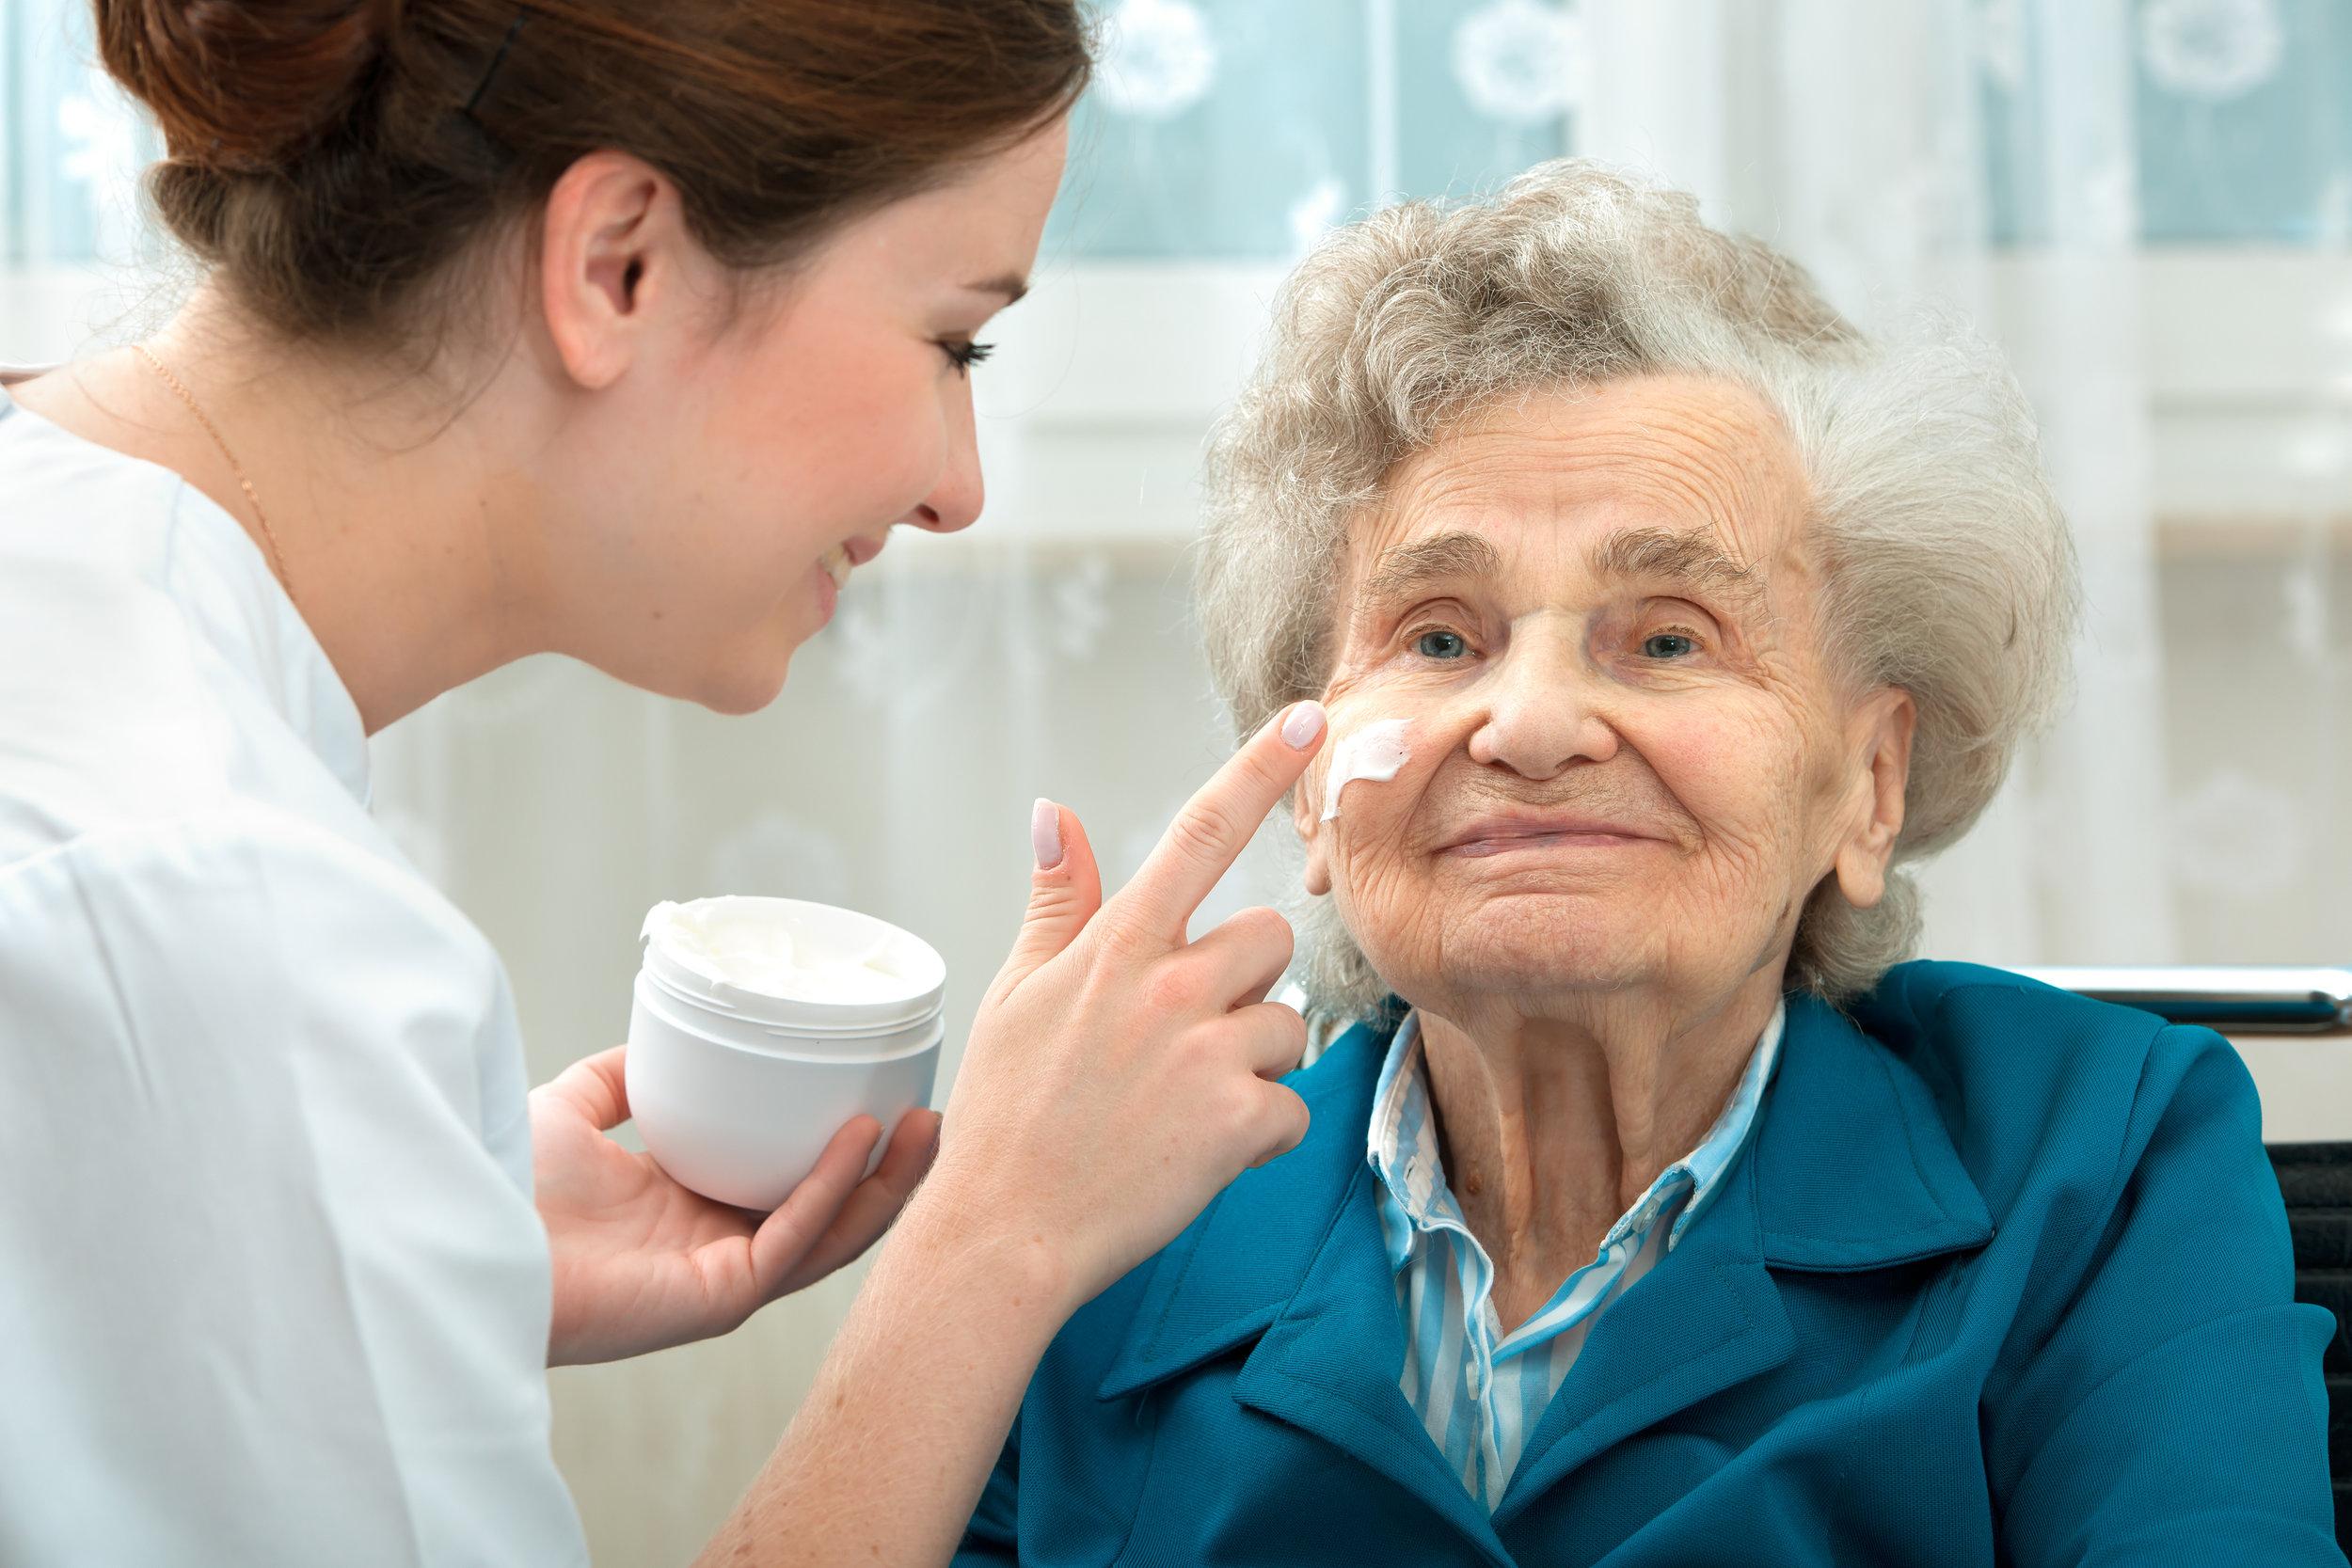 personal care assistance oxford healthcare tulsa oklahoma home healthcare in tulsa.jpg